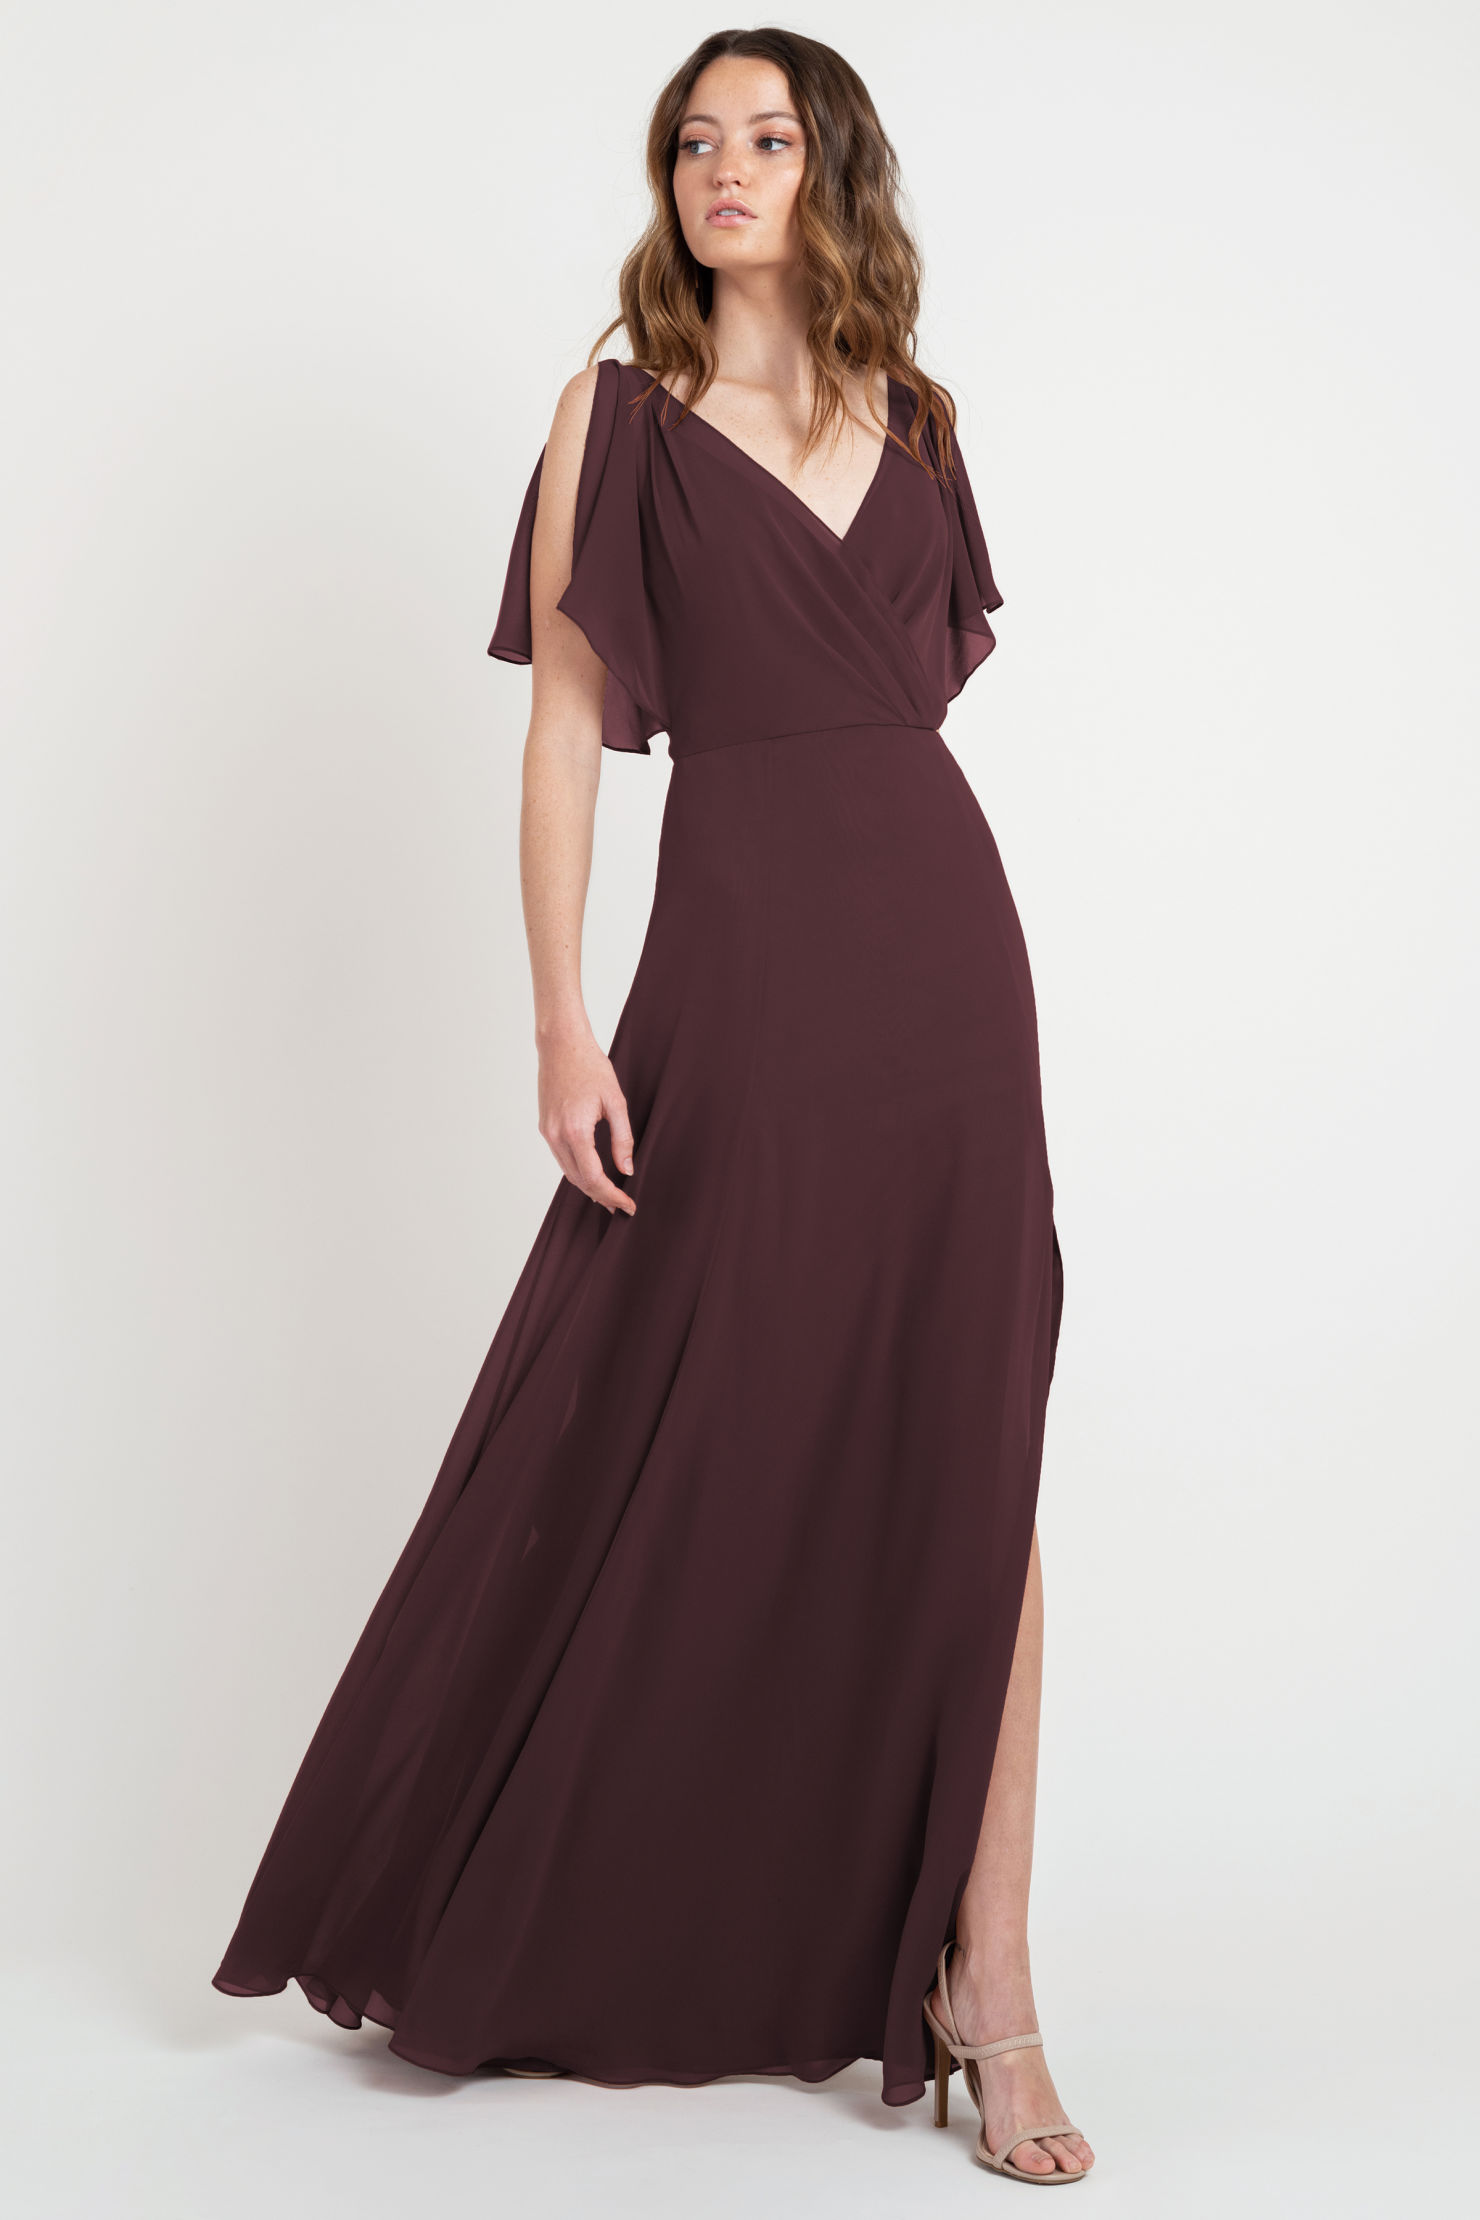 Hayes Bridesmaids Dress by Jenny Yoo - Mahogany